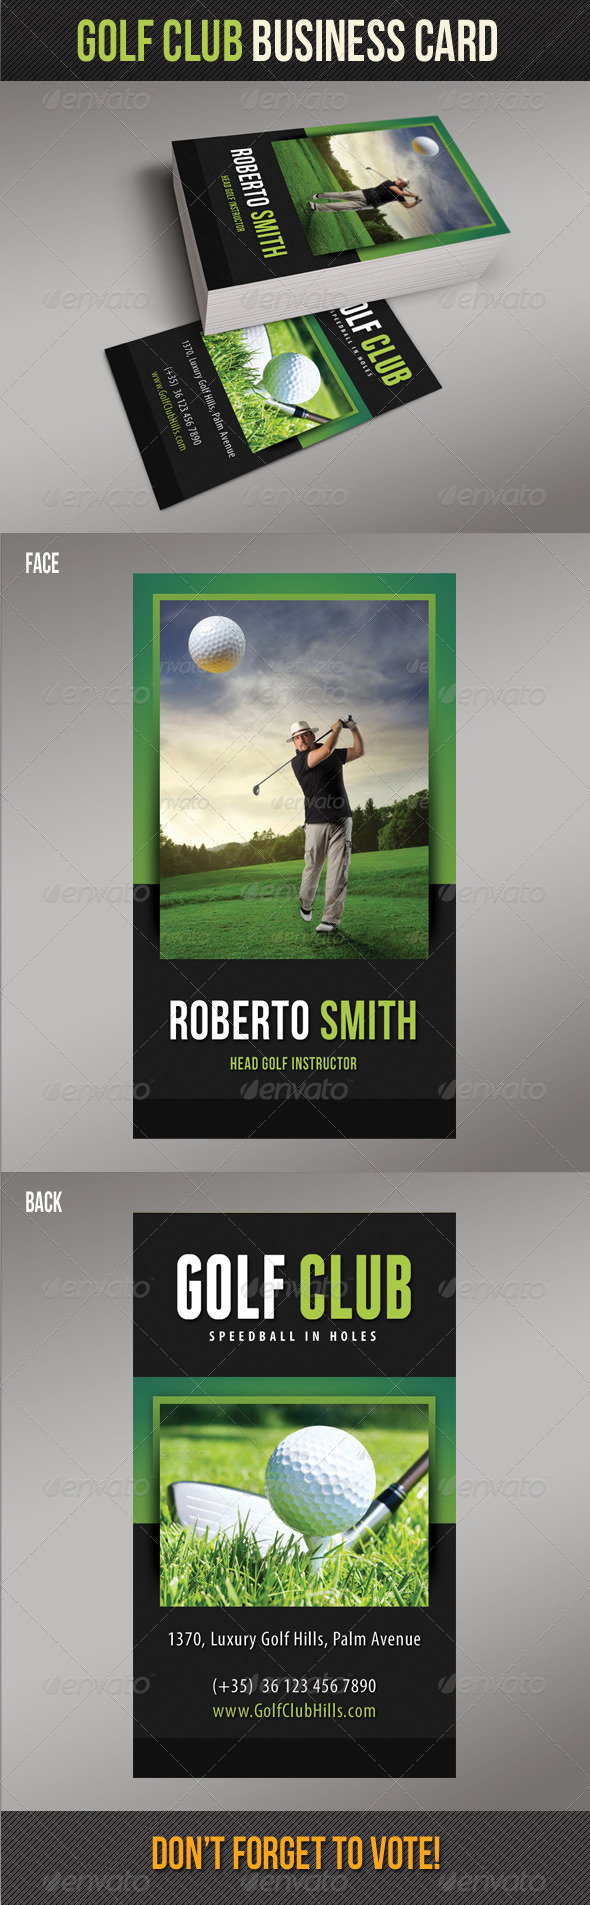 GraphicRiver Golf Club Business Card 02 8138599